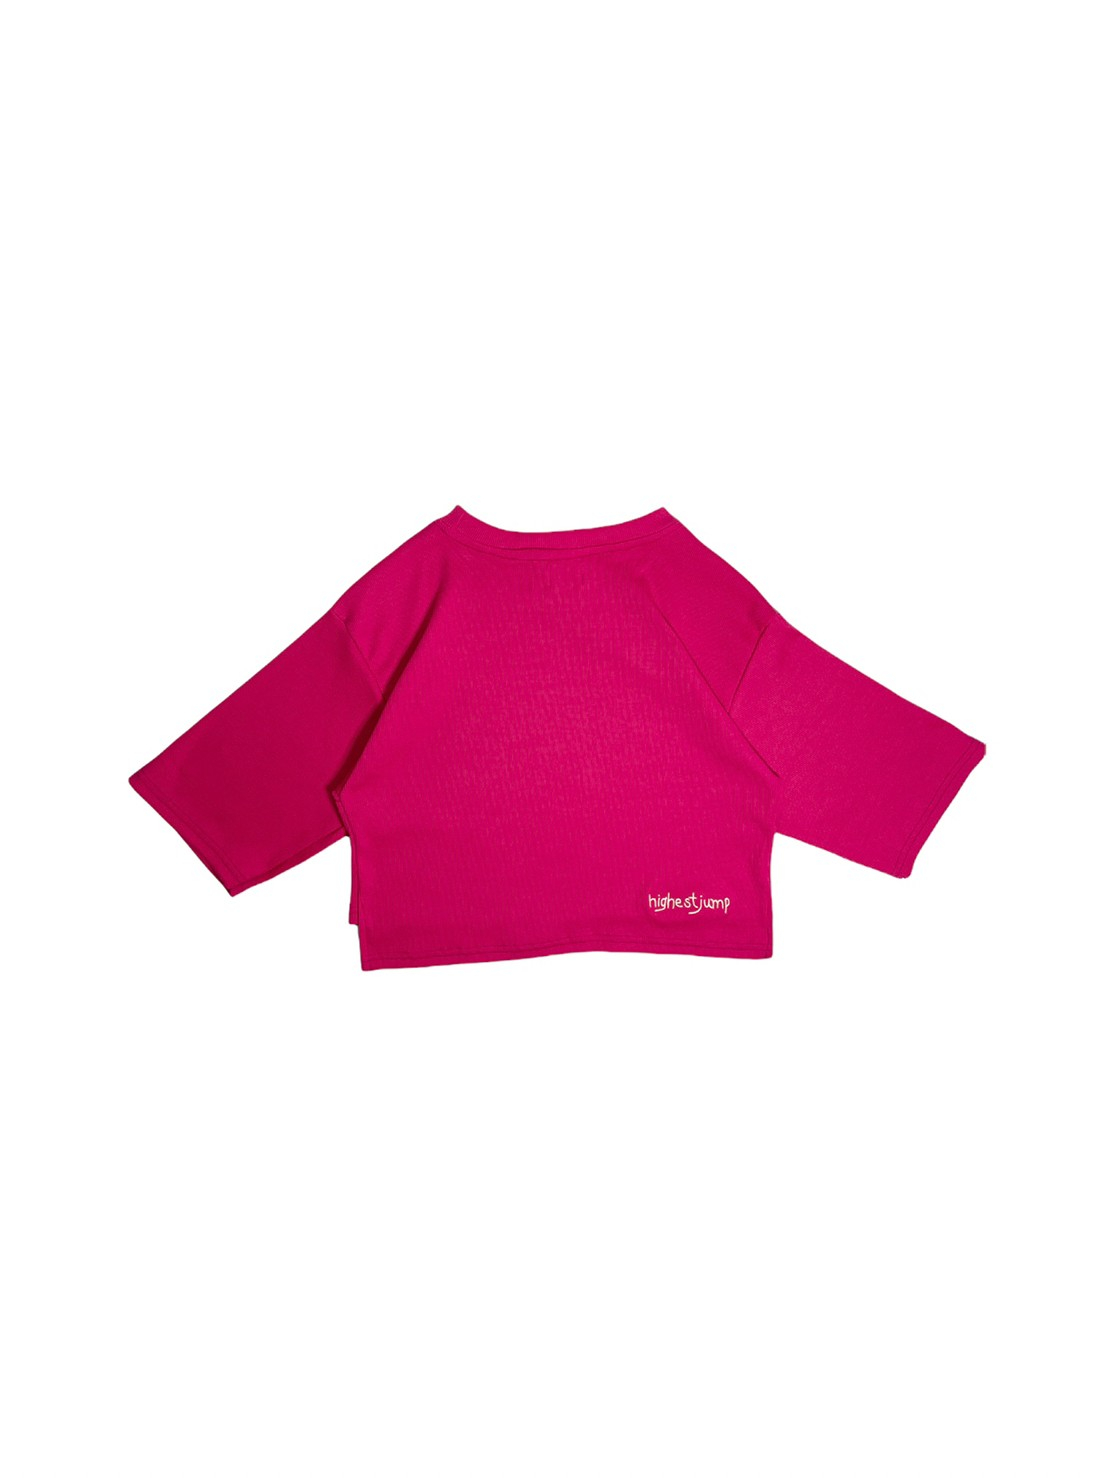 Aster (Pink)